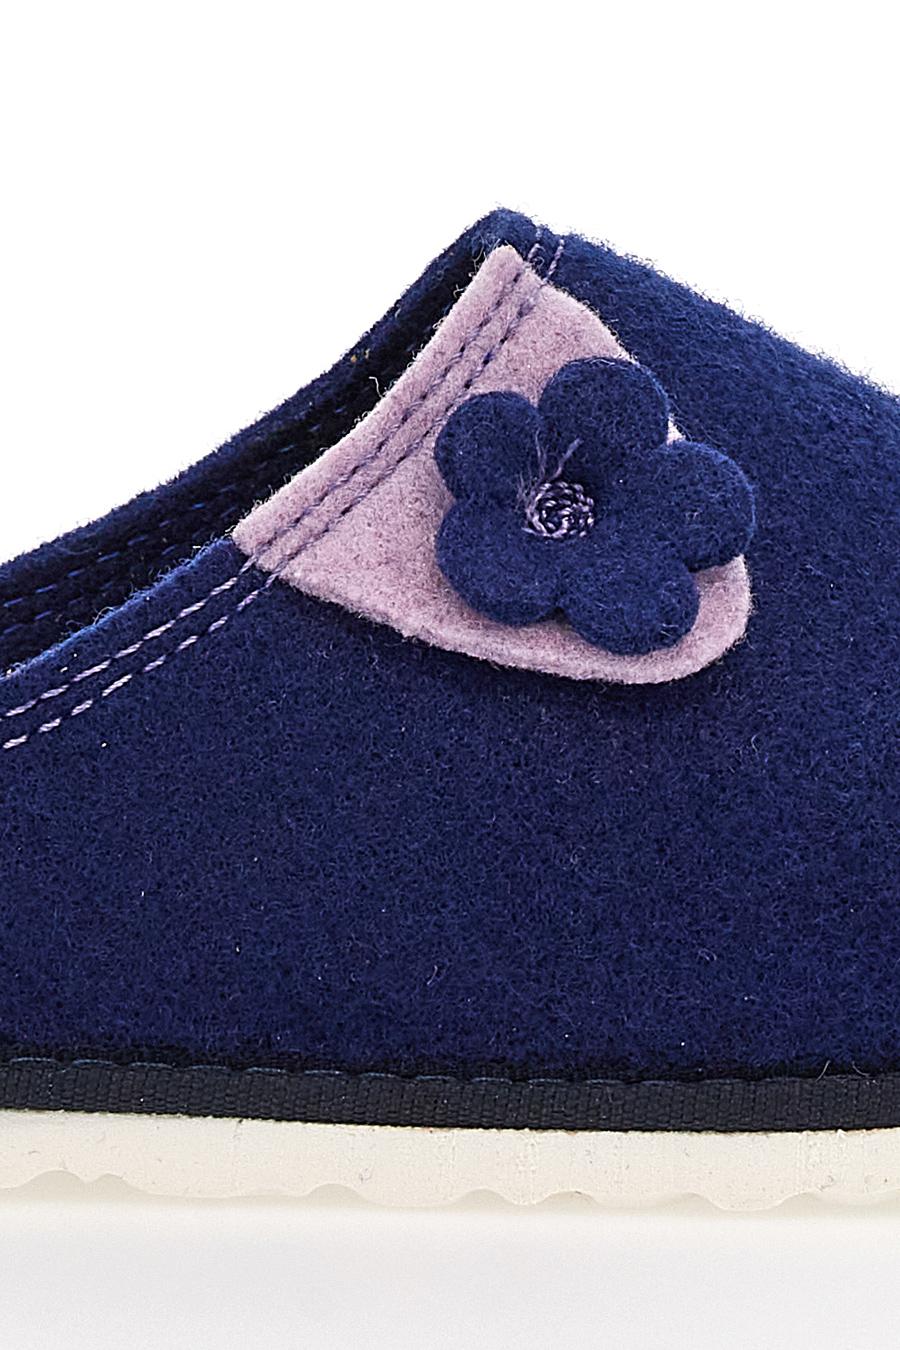 PANTOFOLE donna blu INBLU 32 CS | Pittarello